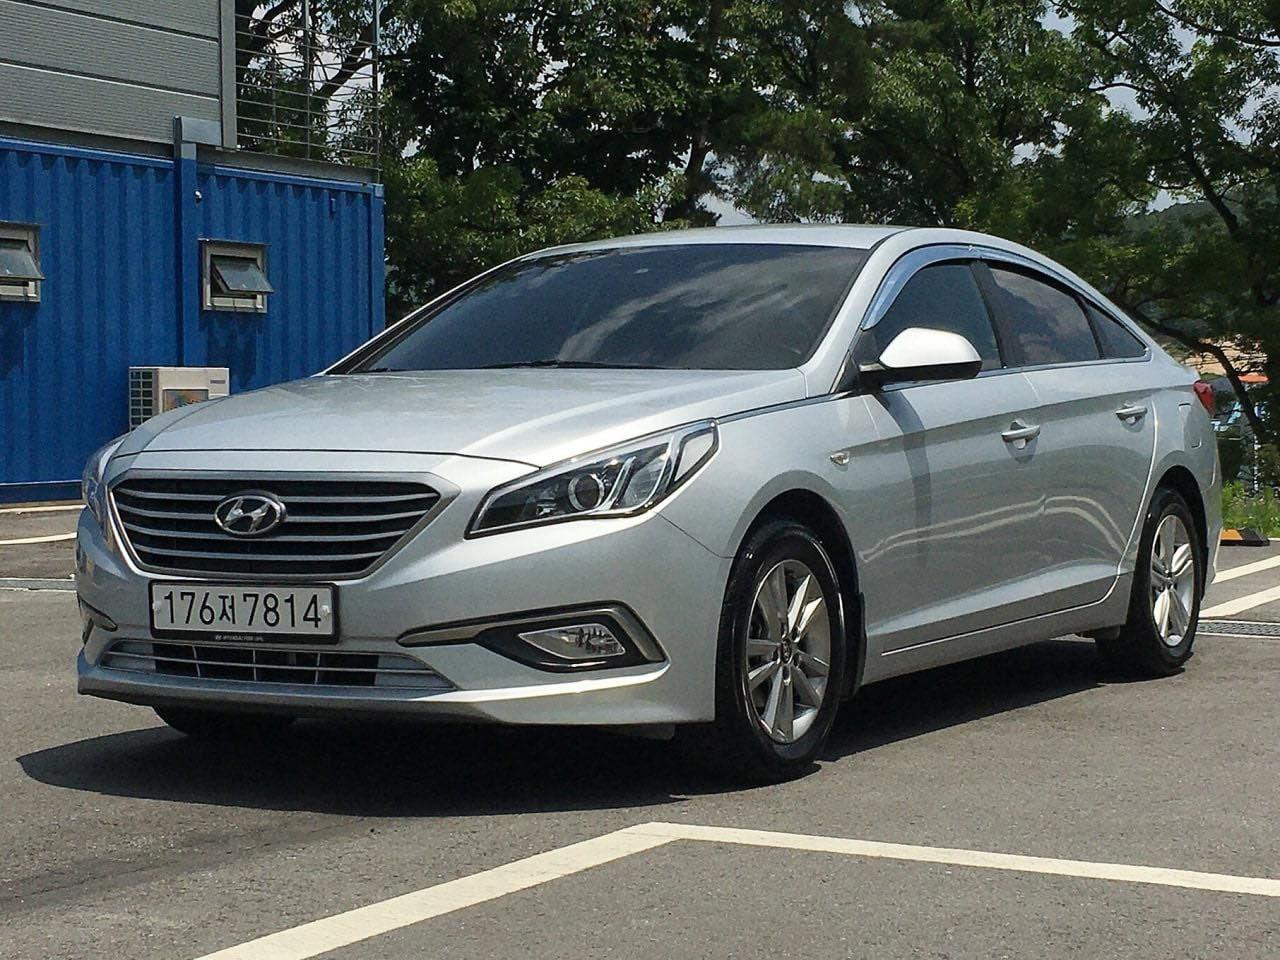 Hyundai Sonata Lpi 2016 Аренда, прокат авто под такси